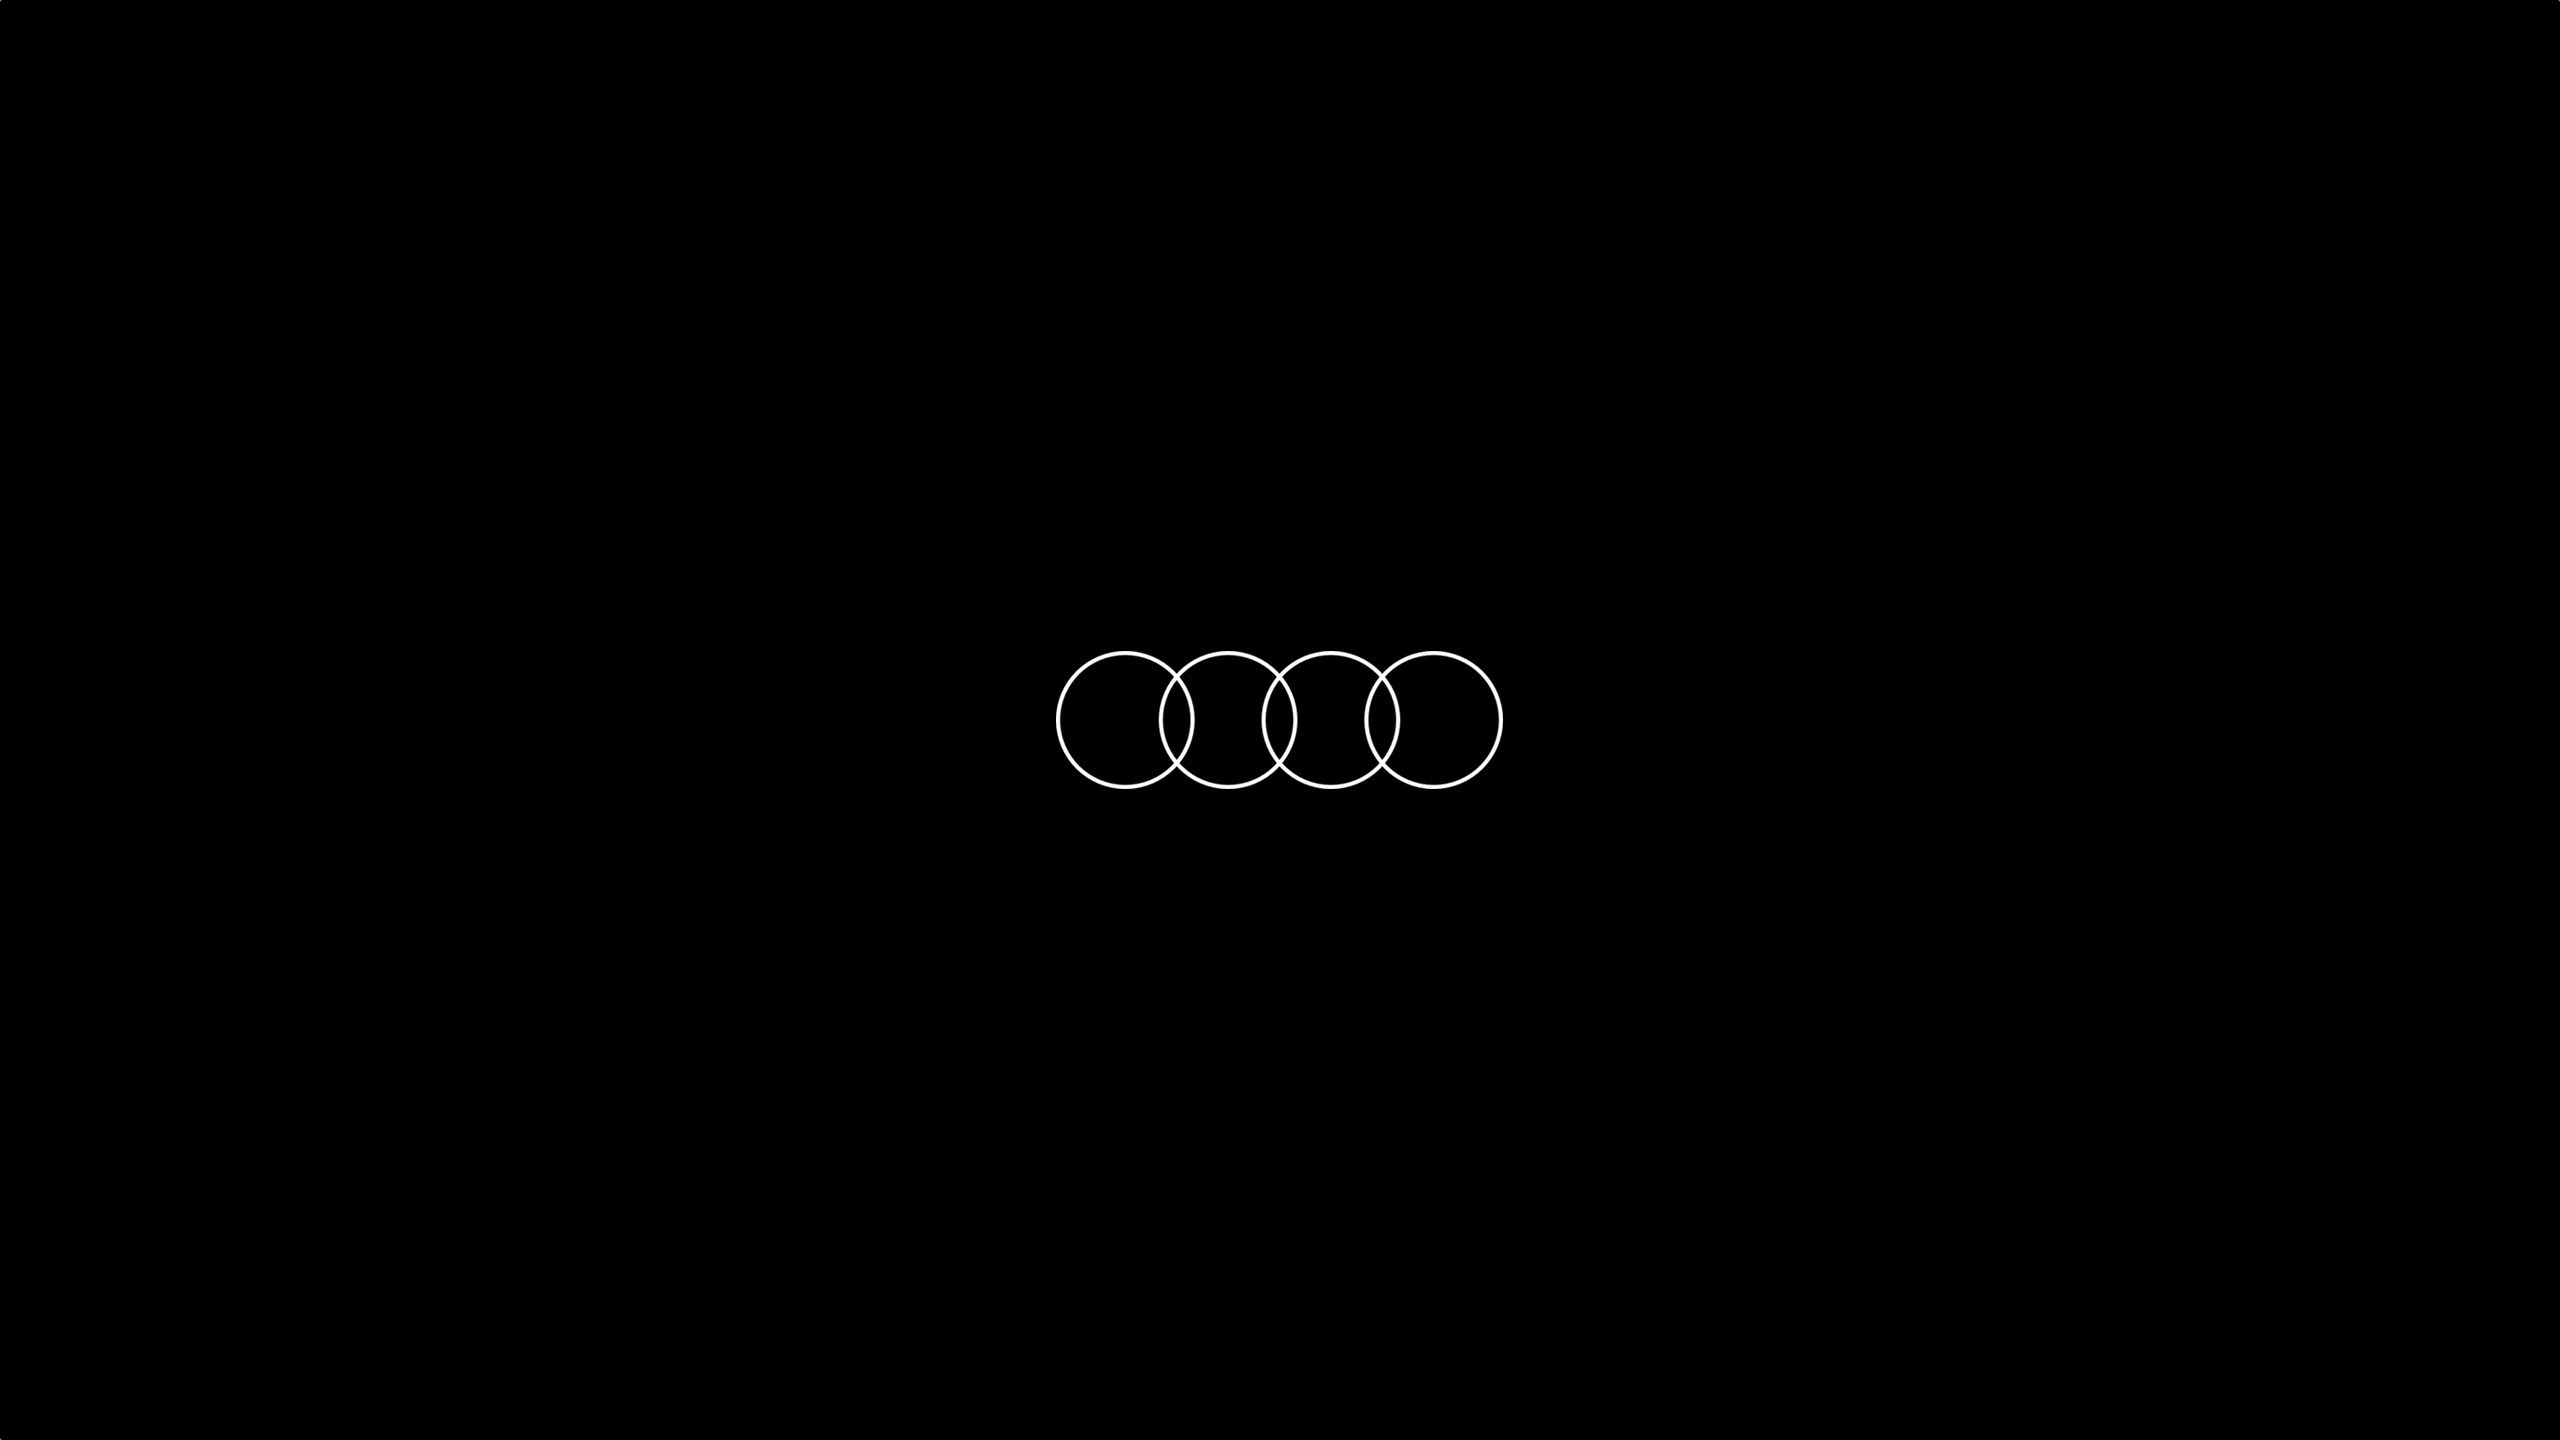 Hd Car Wallpapers 1080p Download Audi Logo Wallpaper Hd Pixelstalk Net